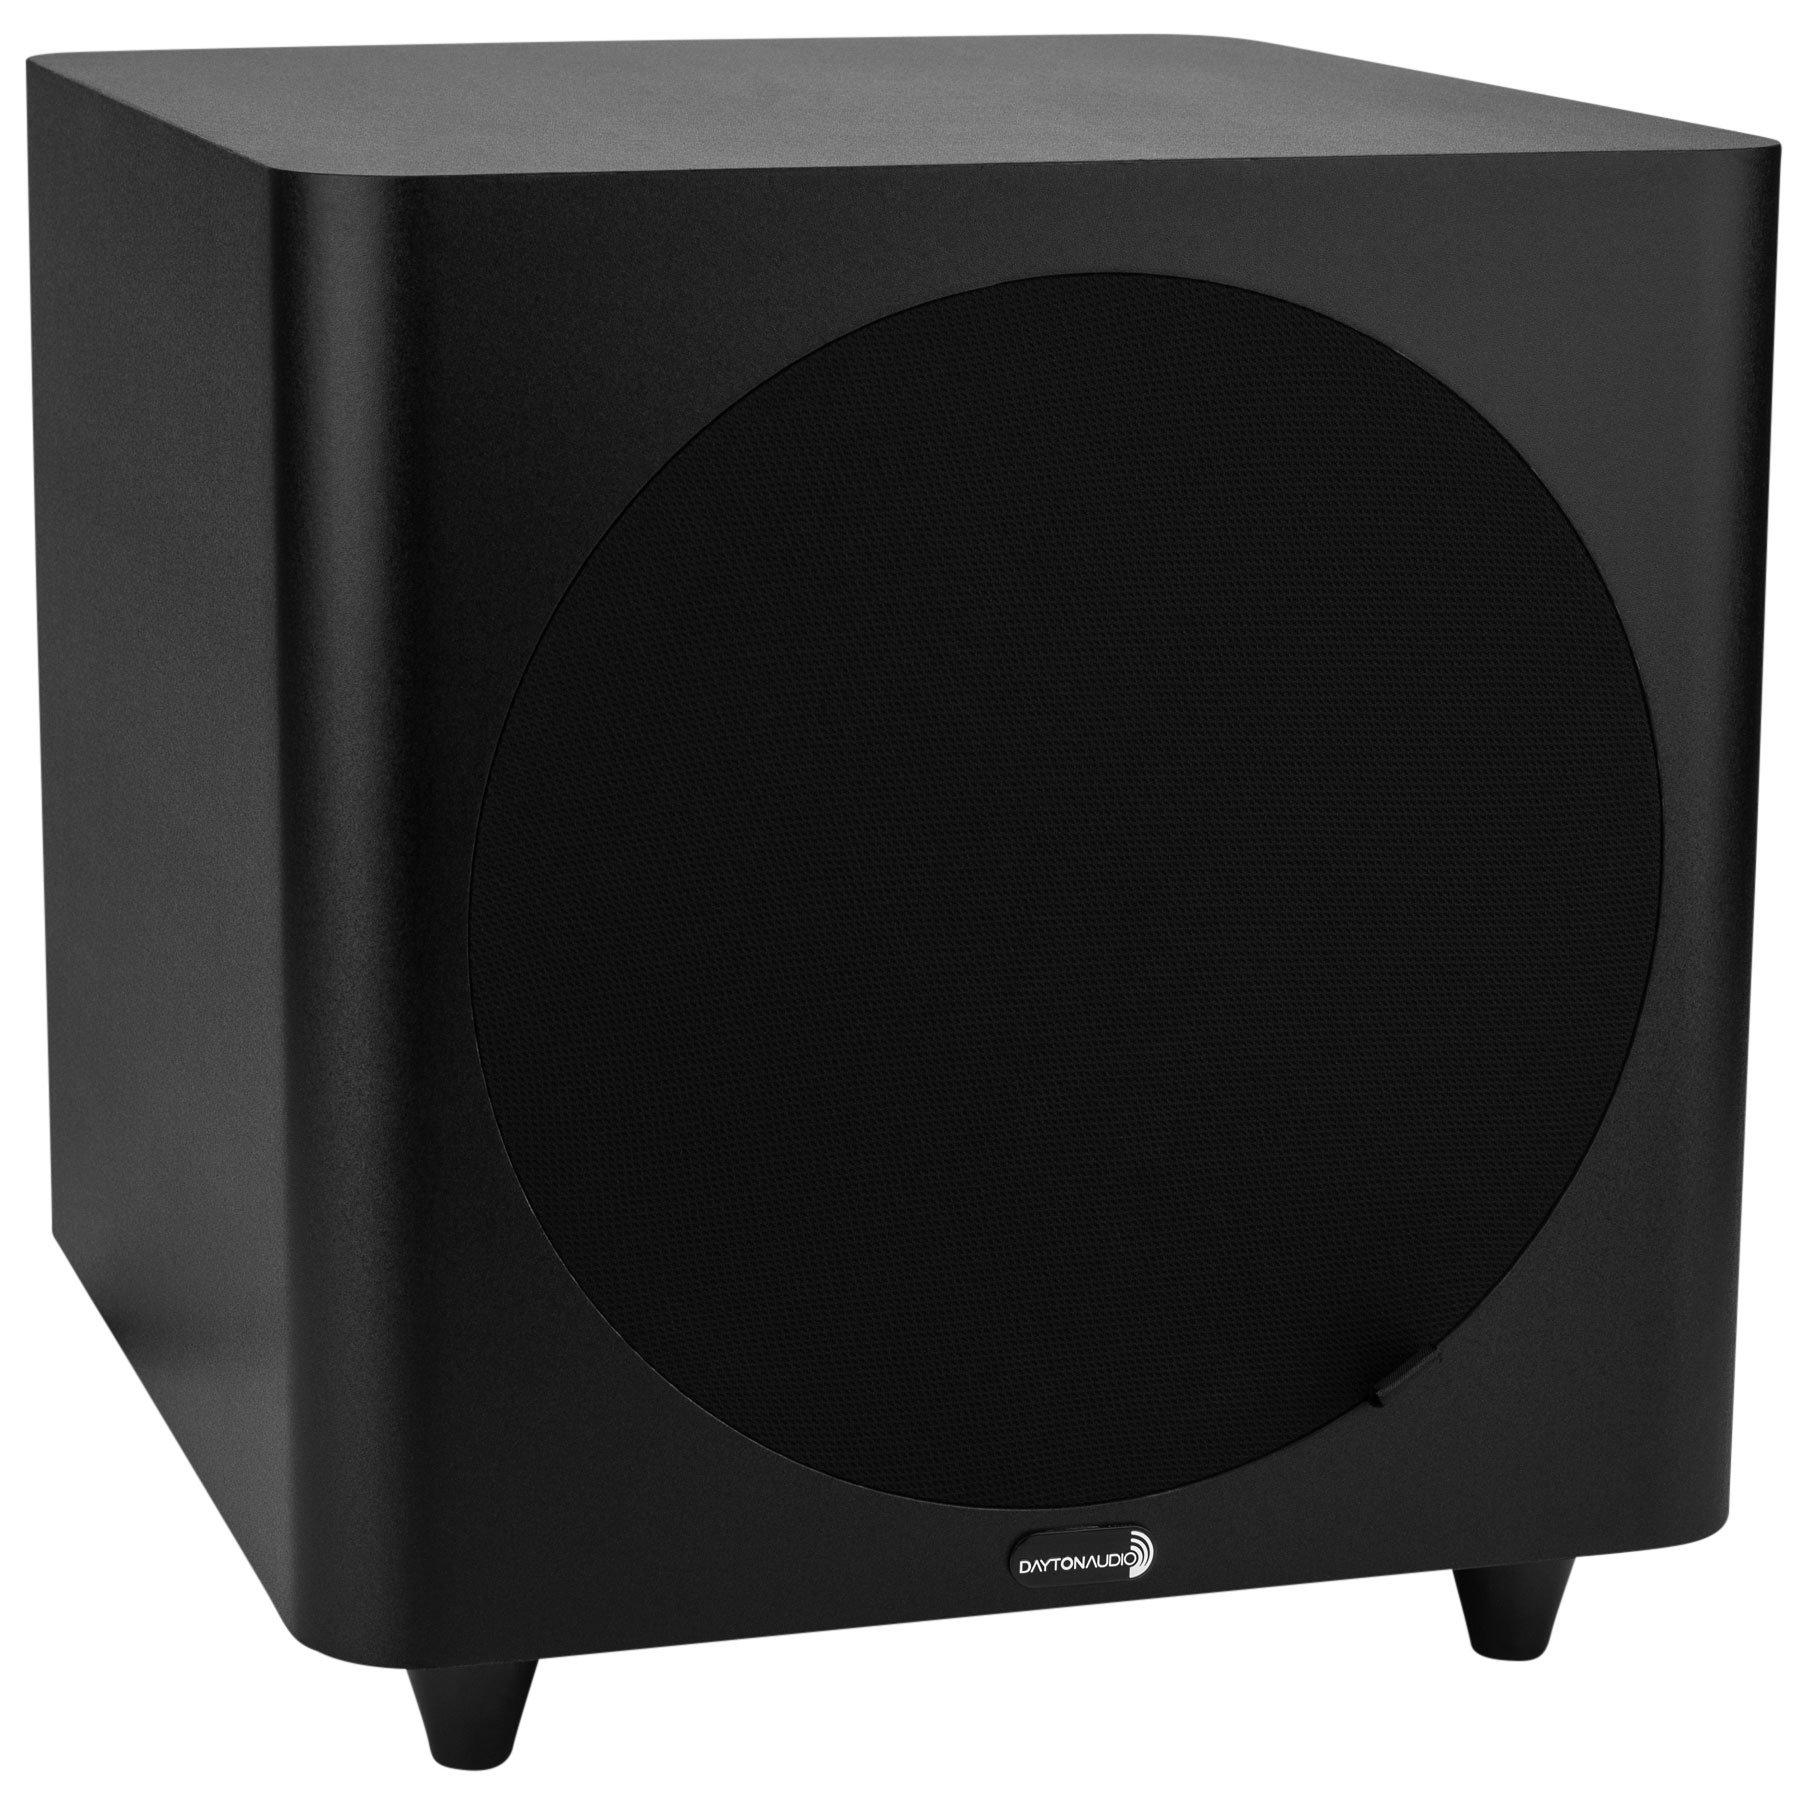 Dayton Audio SUB-800 8-Inch 80 Watt Powered Subwoofer (Black) by Dayton Audio